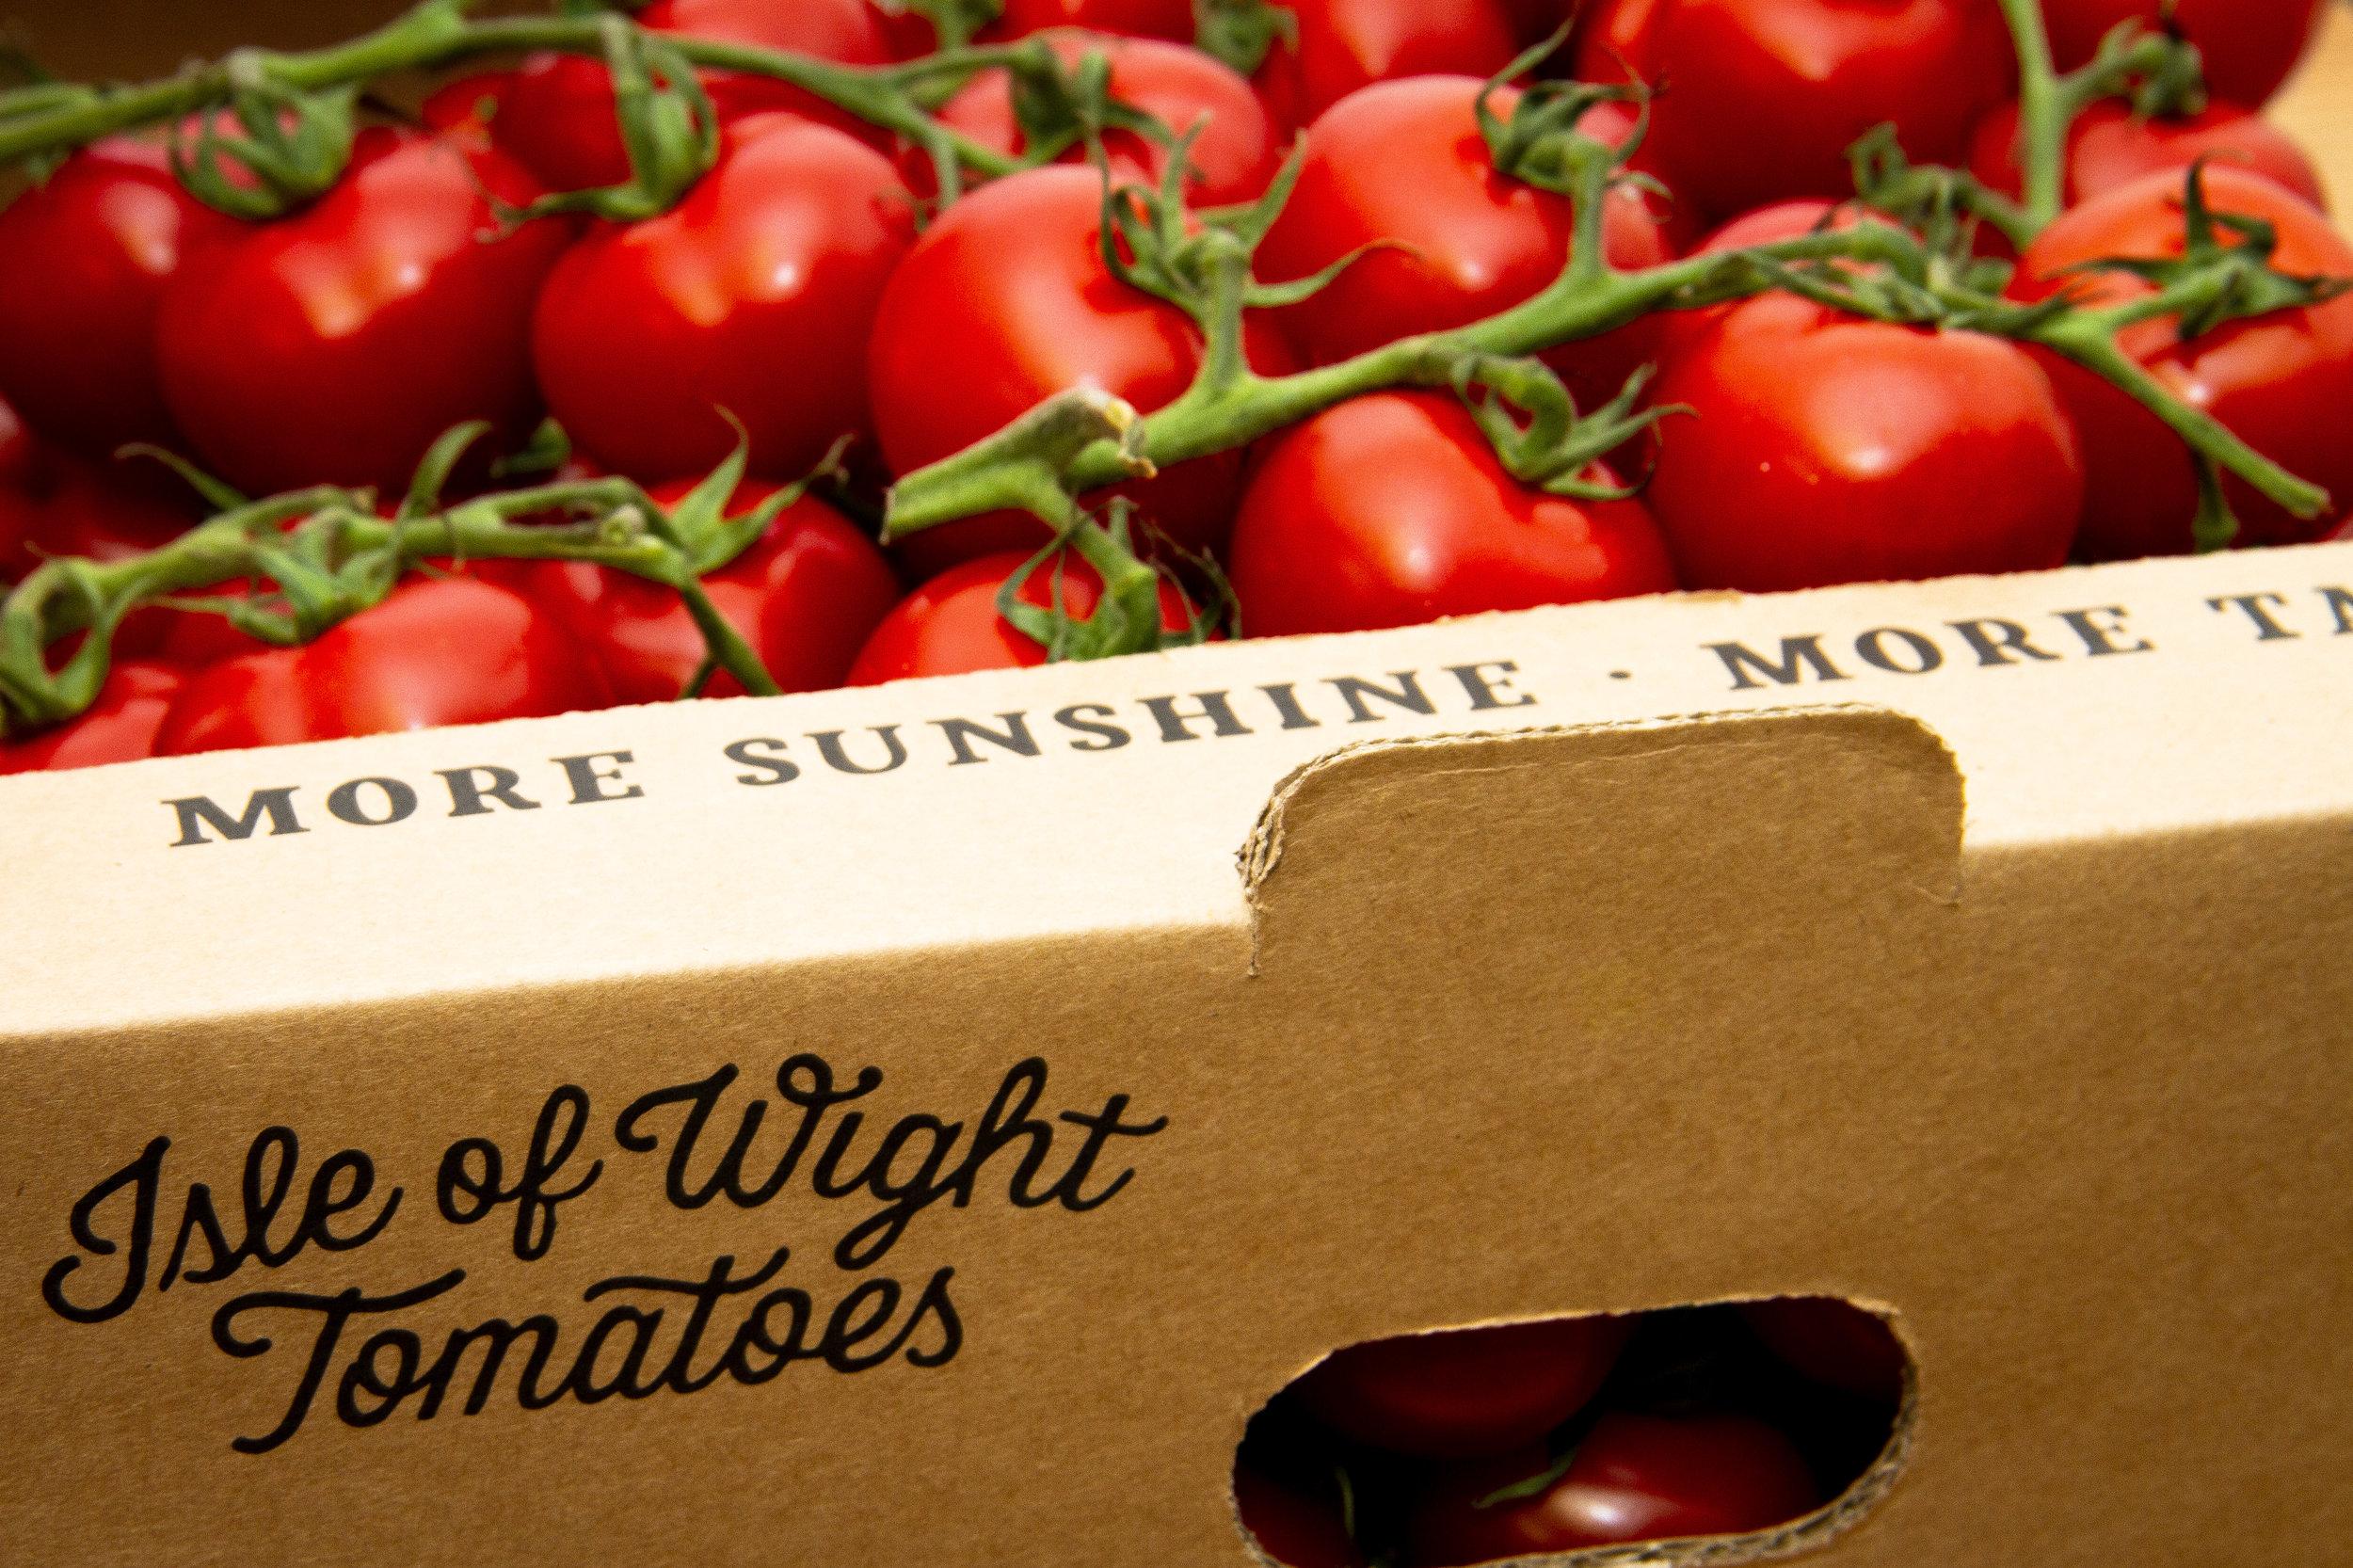 Isle of Wight Tomatoes.jpg